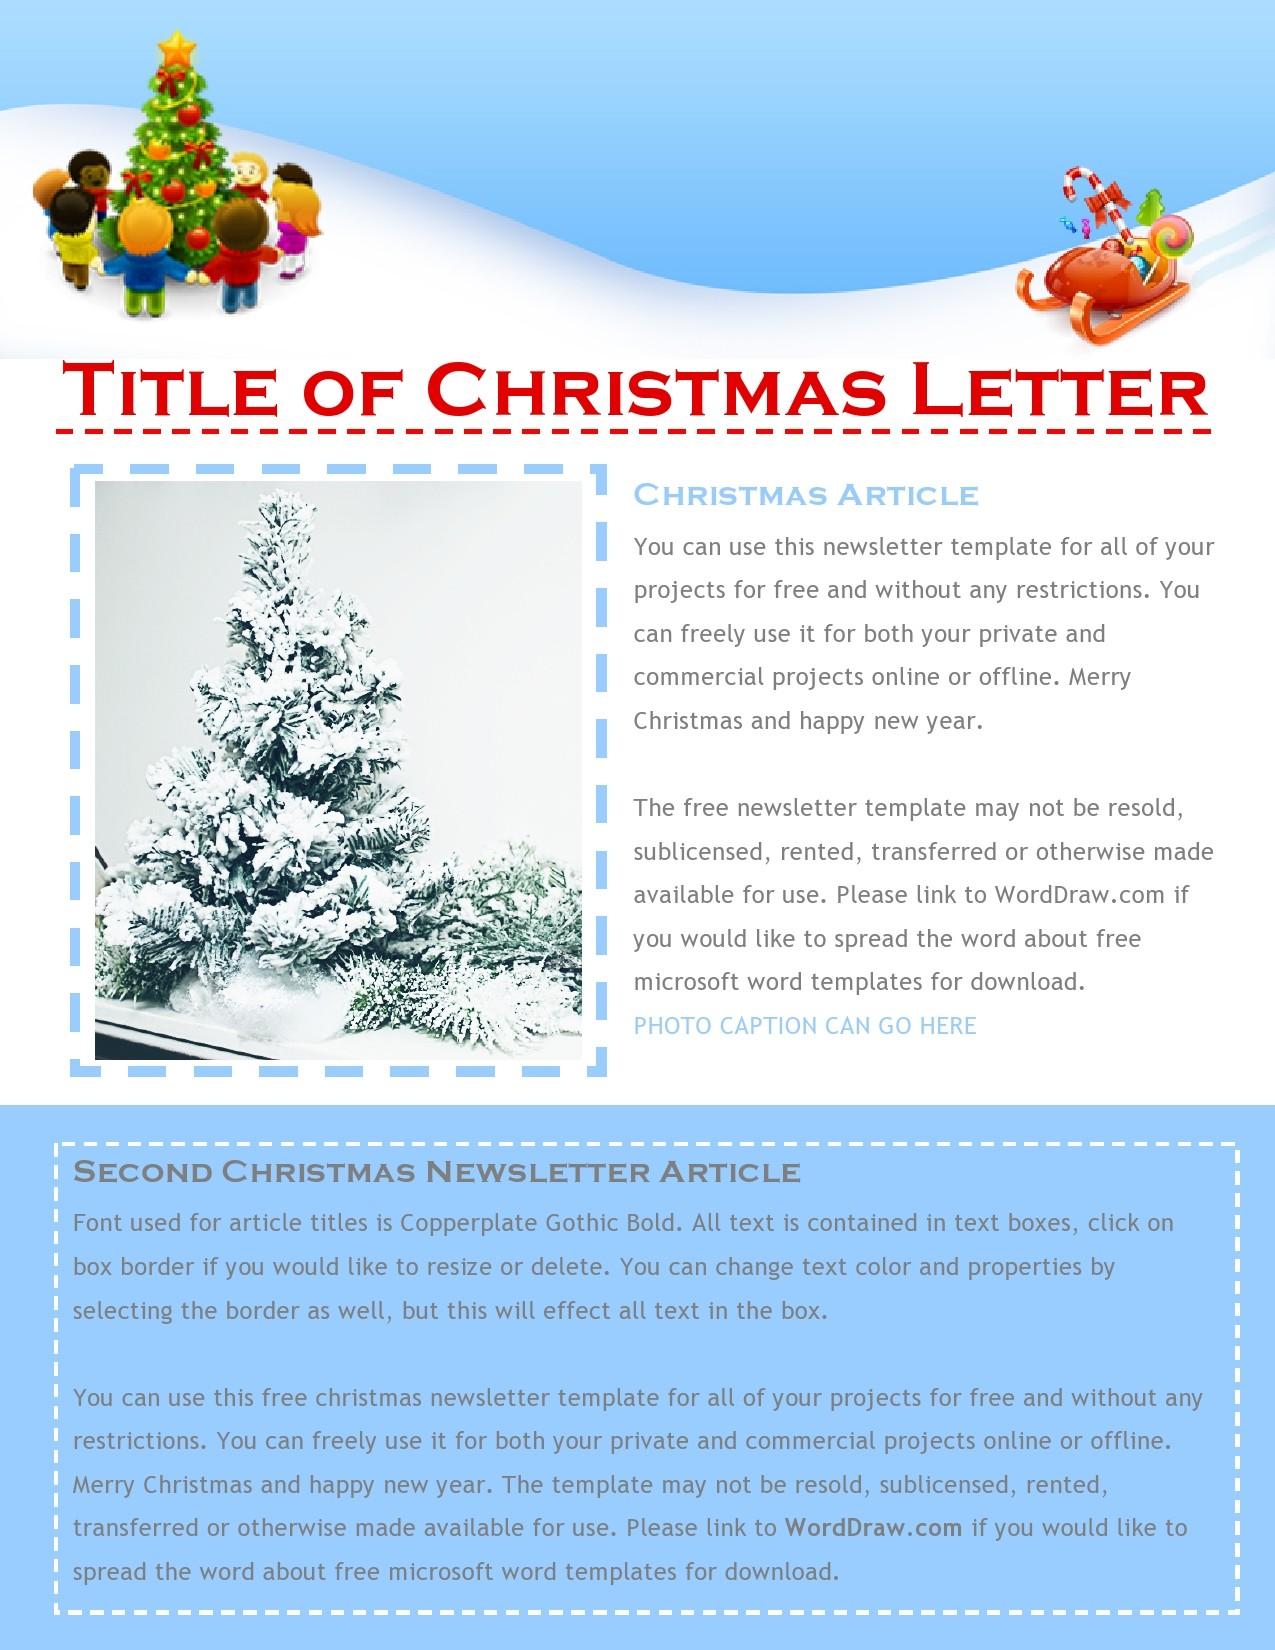 45 Printable Christmas Letter Templates FREE